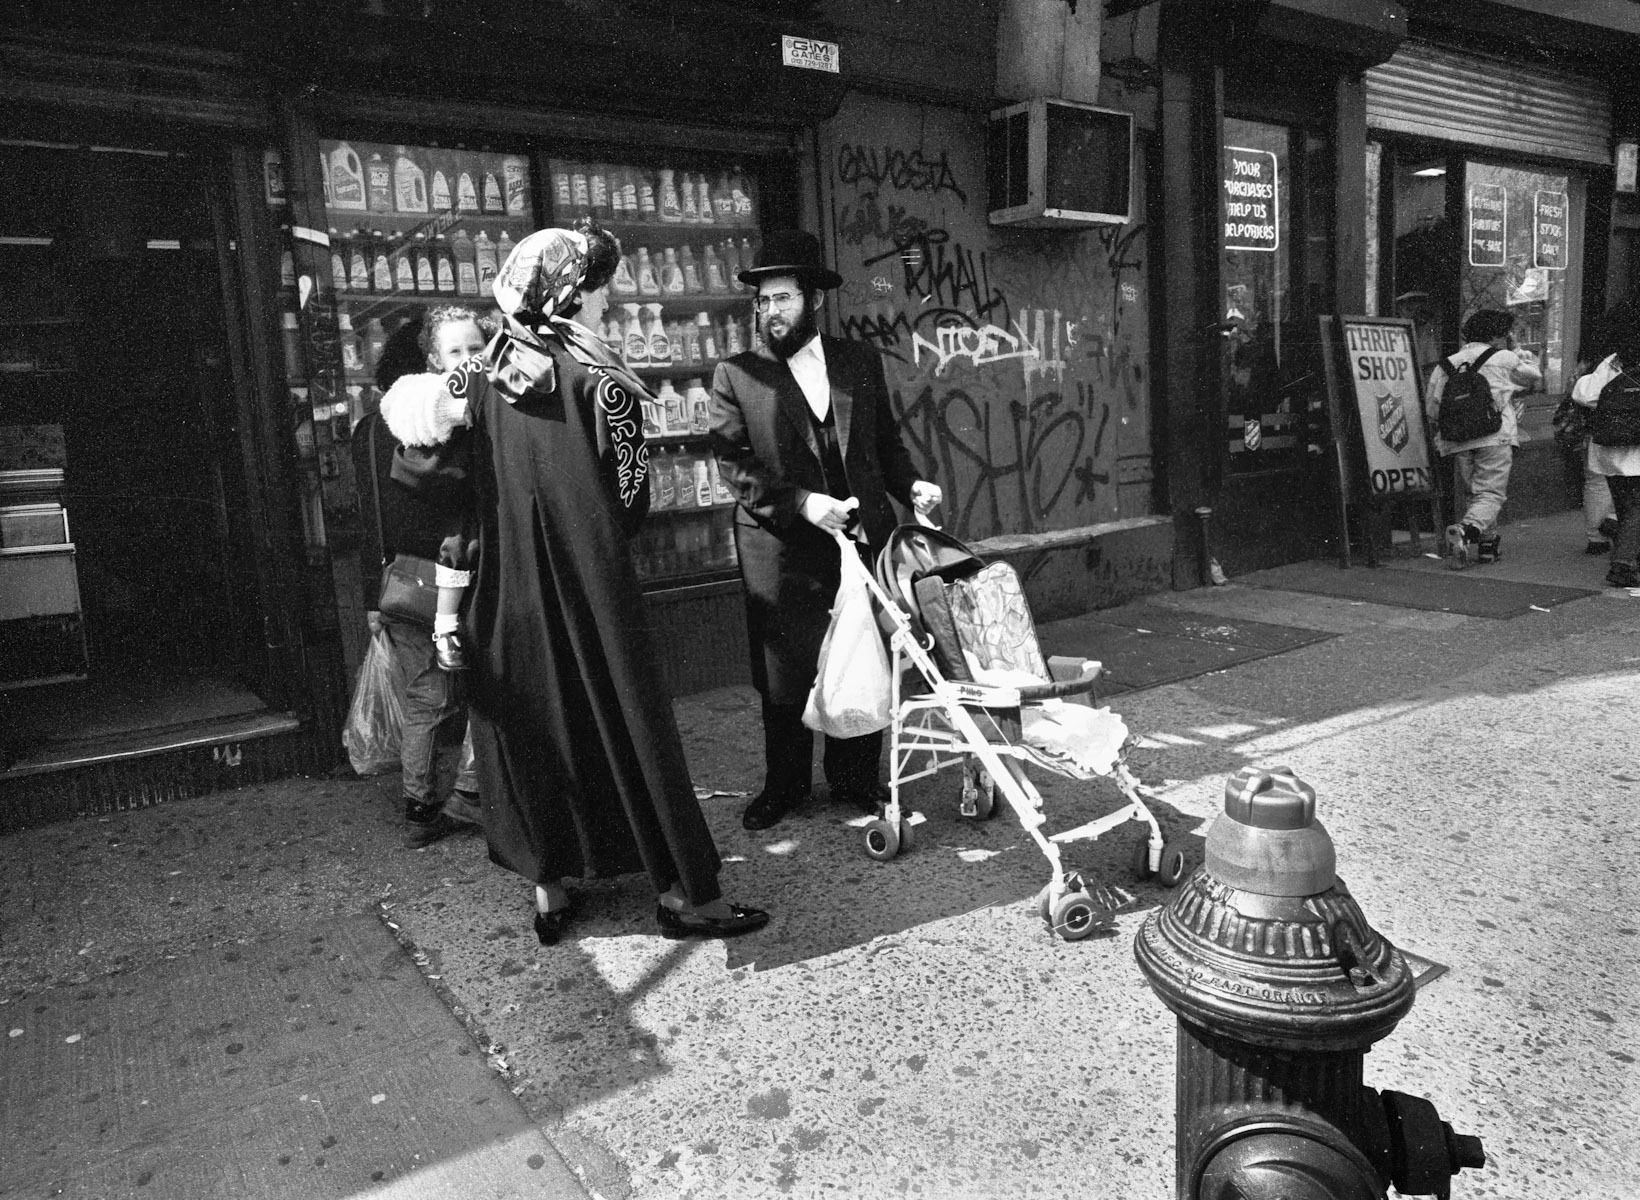 Lower East Side, New York 04/19/94